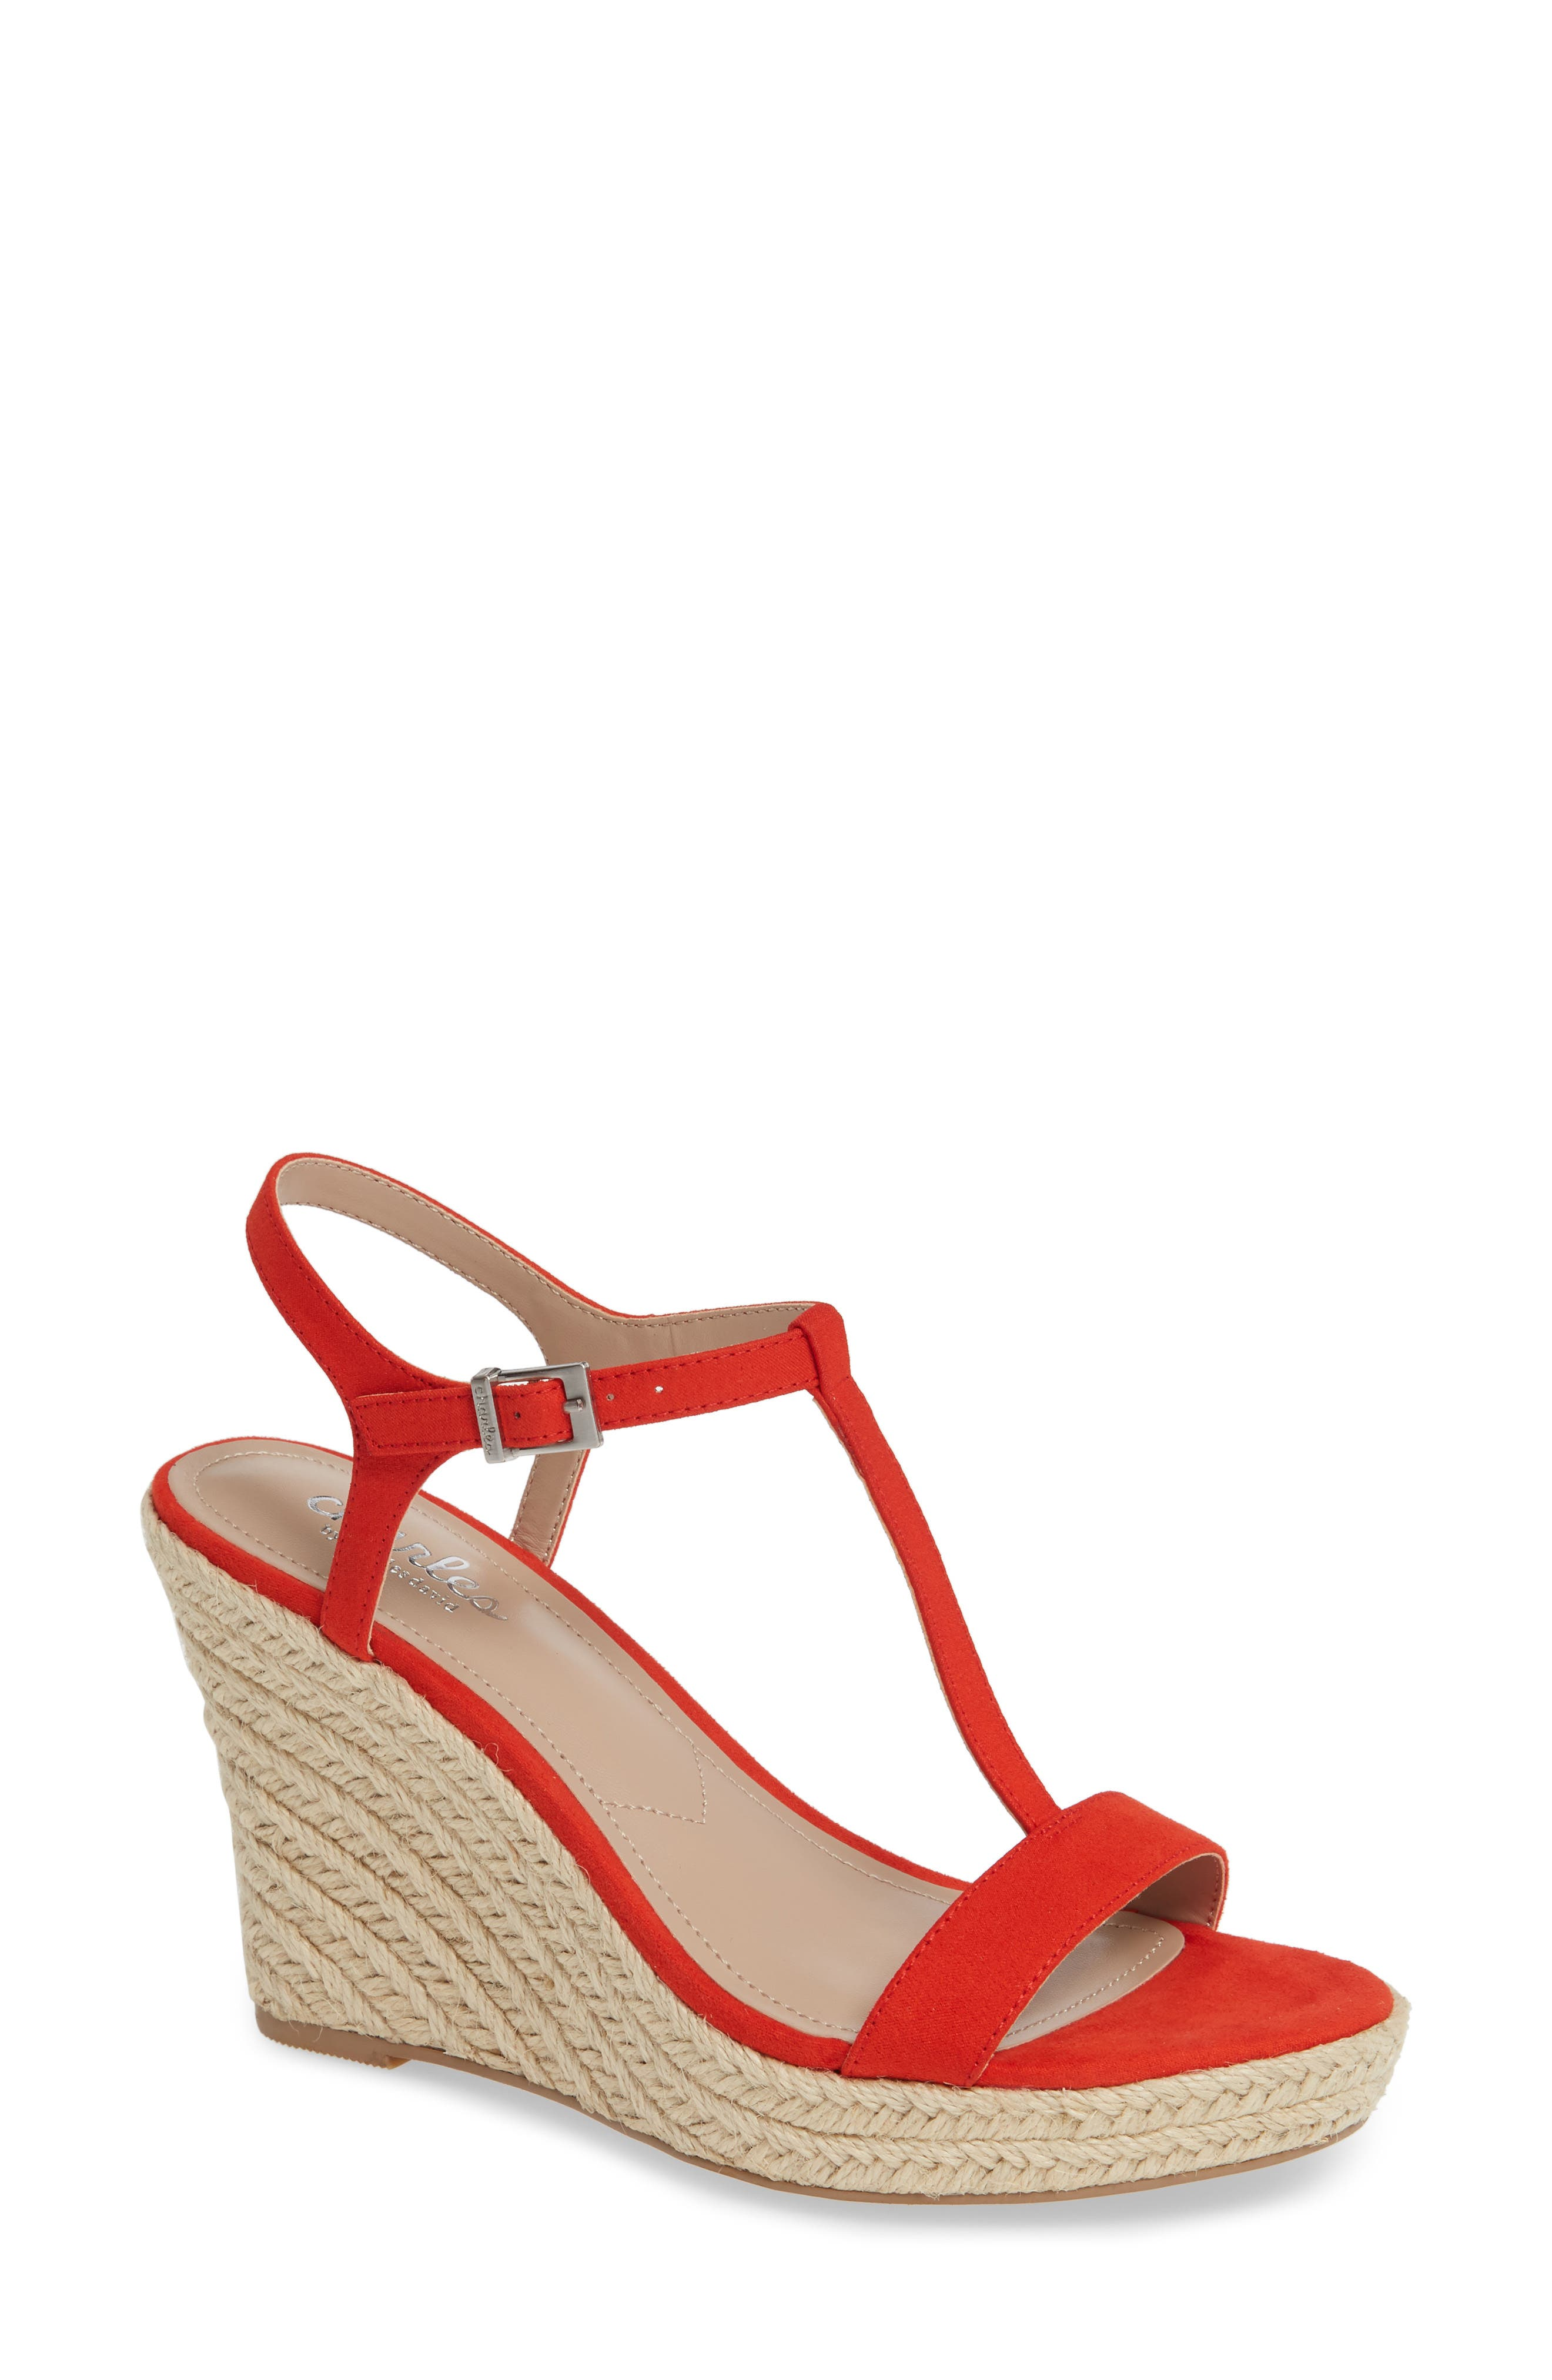 Charles By Charles David Lili T-Strap Wedge Sandal, Red